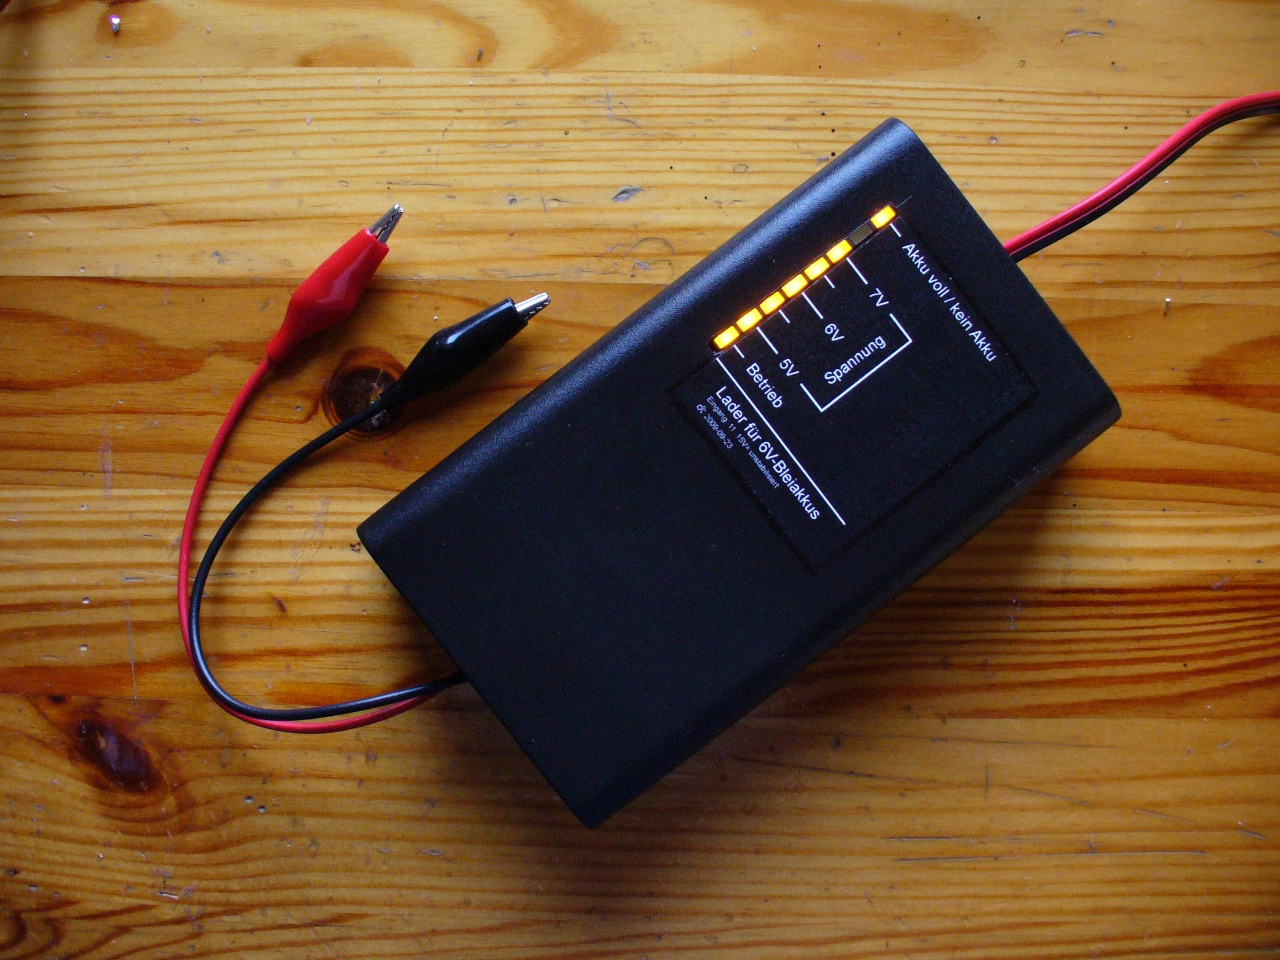 Akkulader Fr 6v Bleiakkus Led Voltmeter 5012 Psu Batt Chargers Electronic Components Mit Fertig Anzeige Und